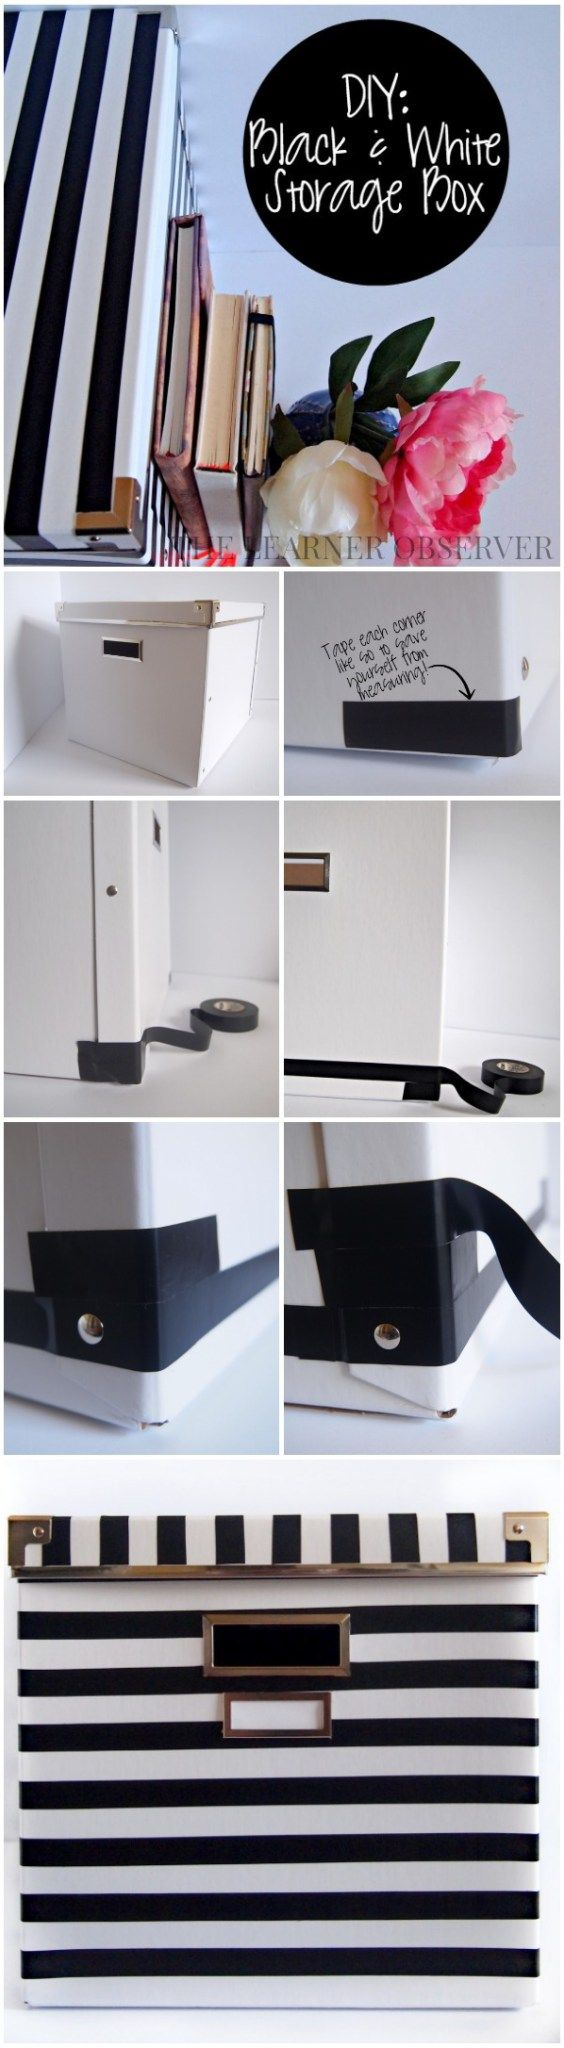 ikea office storage boxes. DIY Black \u0026 White Stripe Storage Box | Ikea Hack Office Boxes A